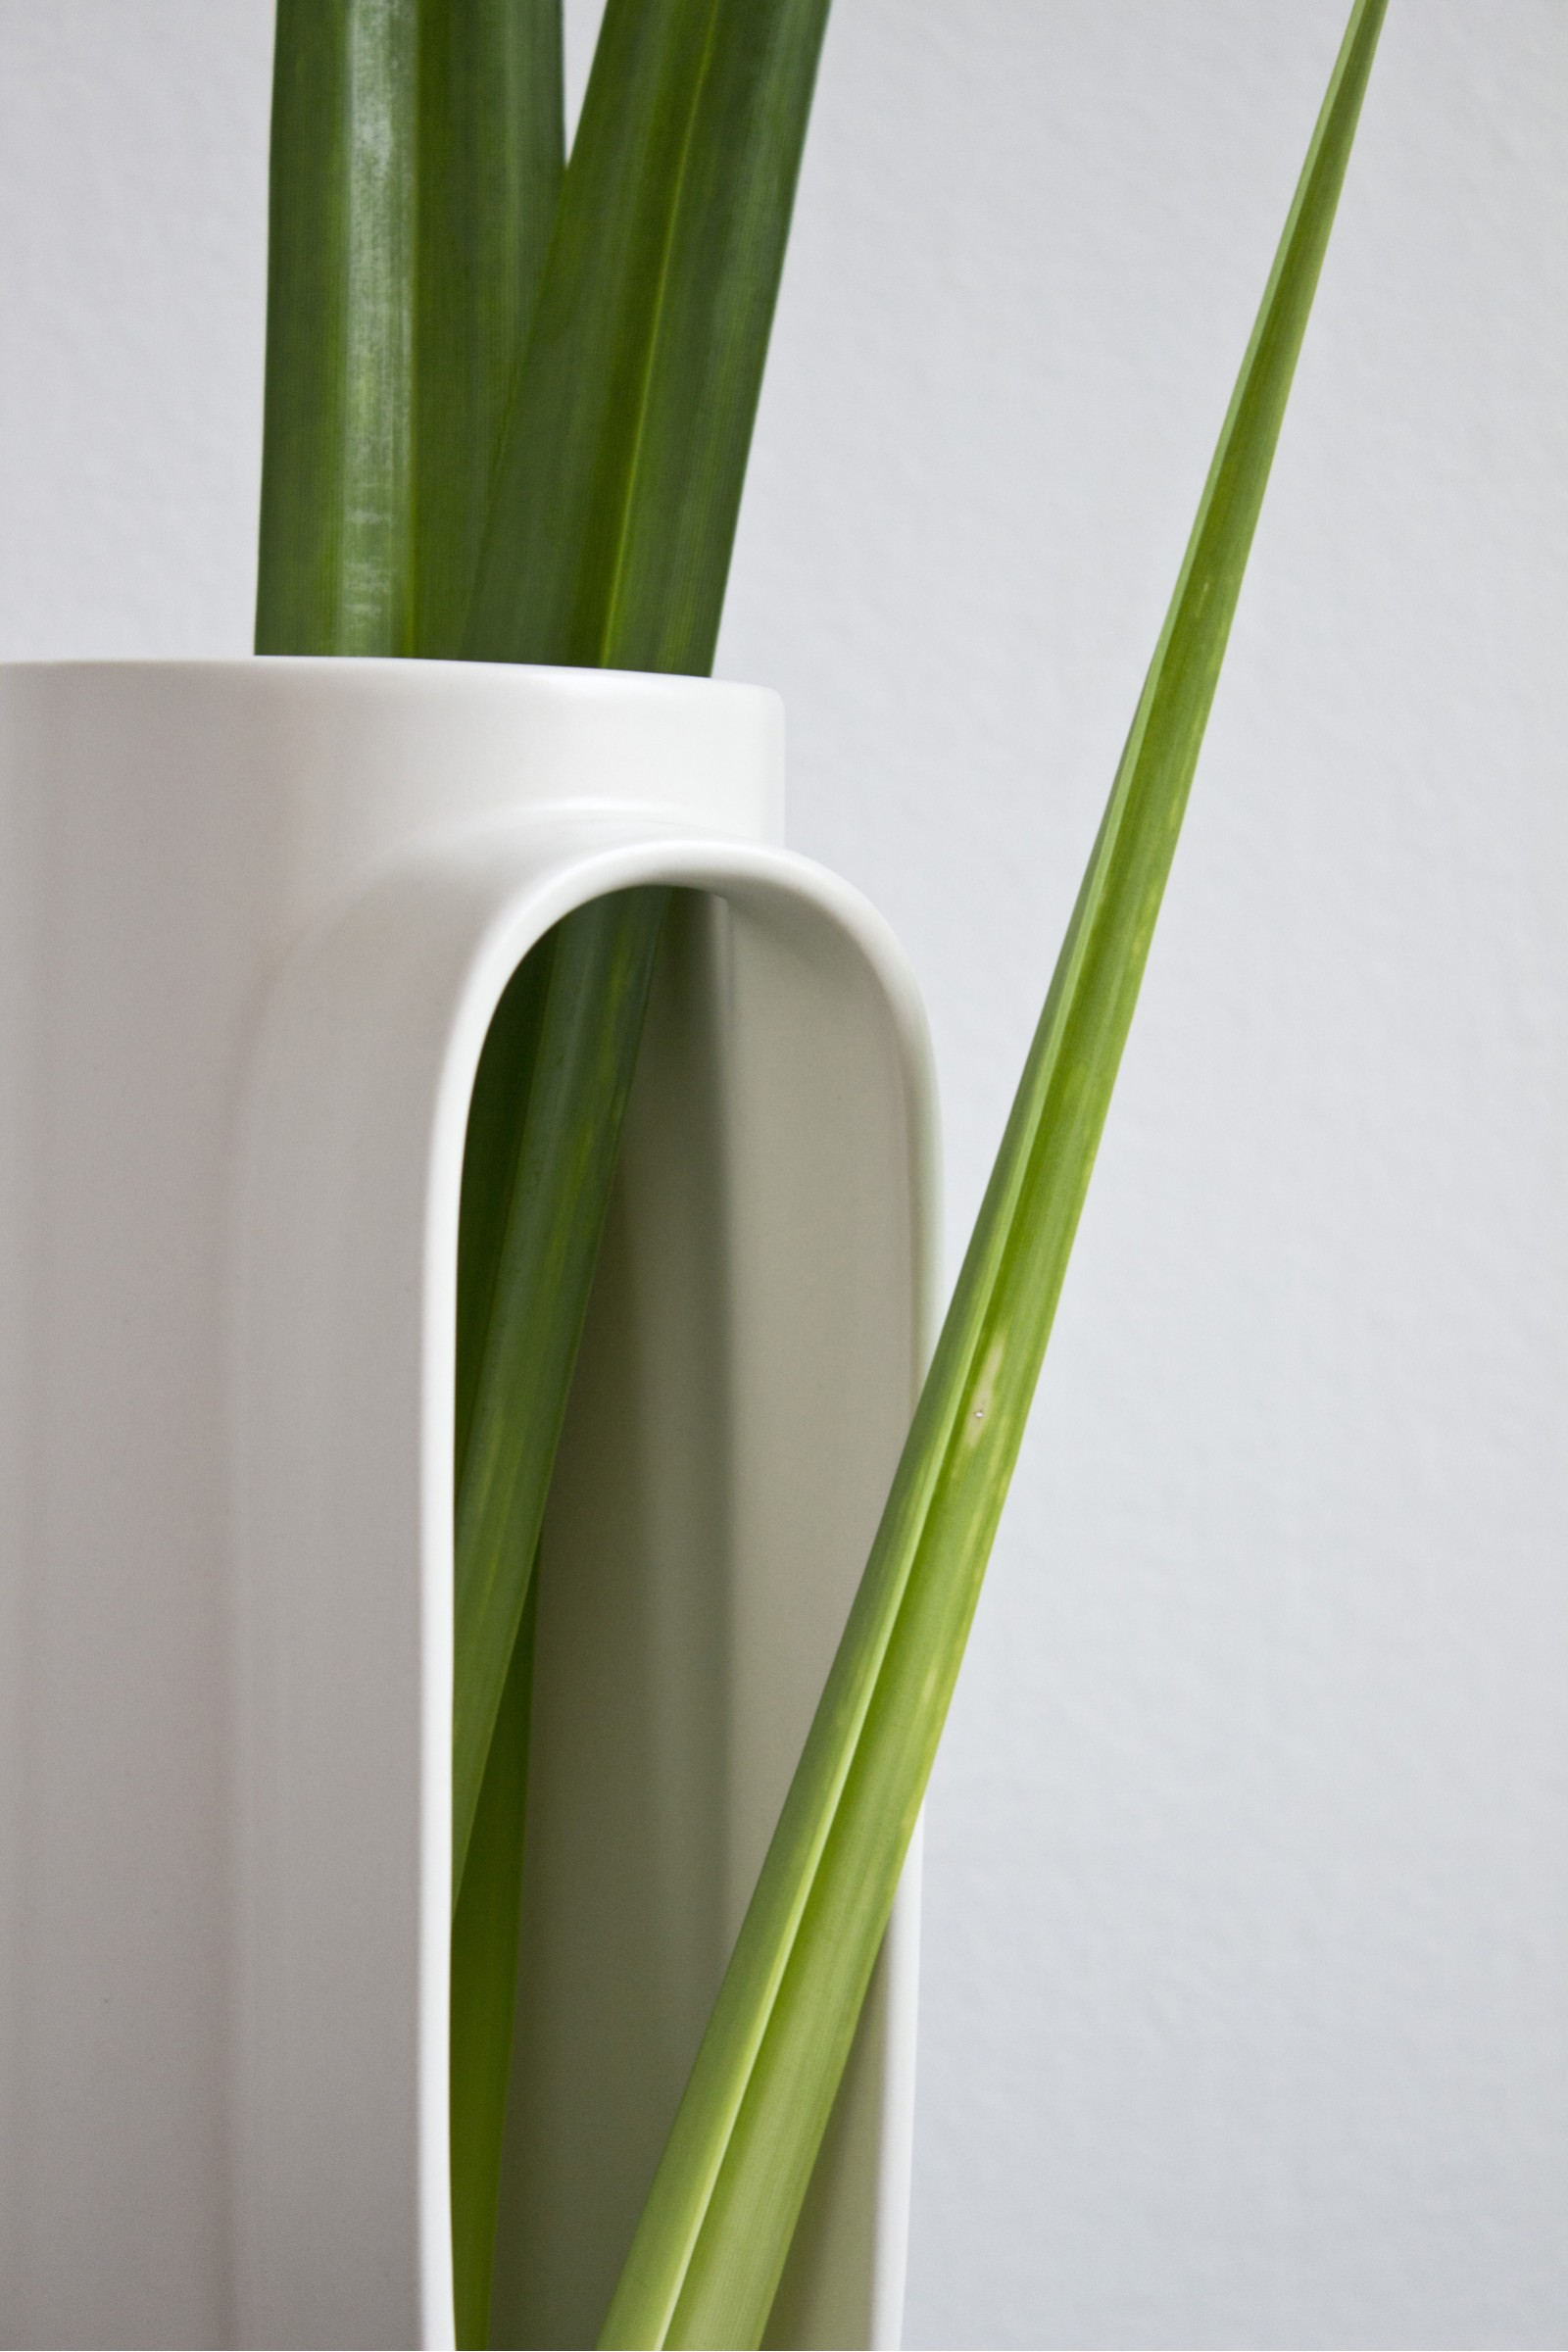 vase-design-kodama-comingb-03